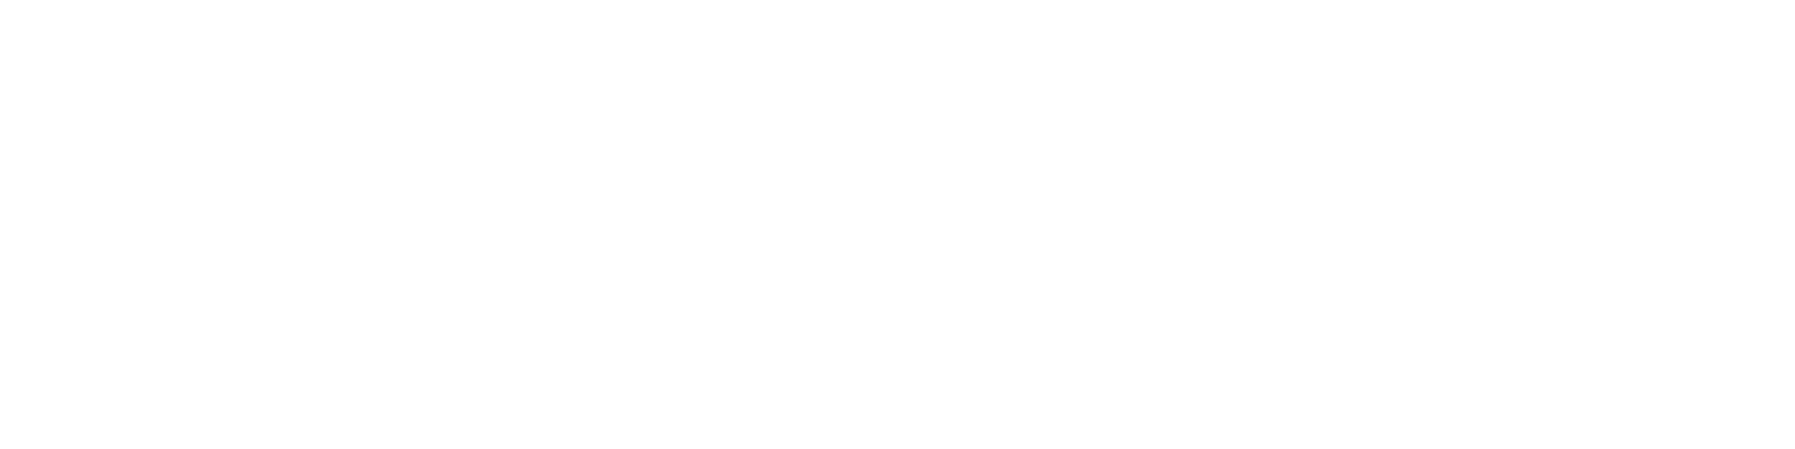 StartupTourism_Logo_White copy.png